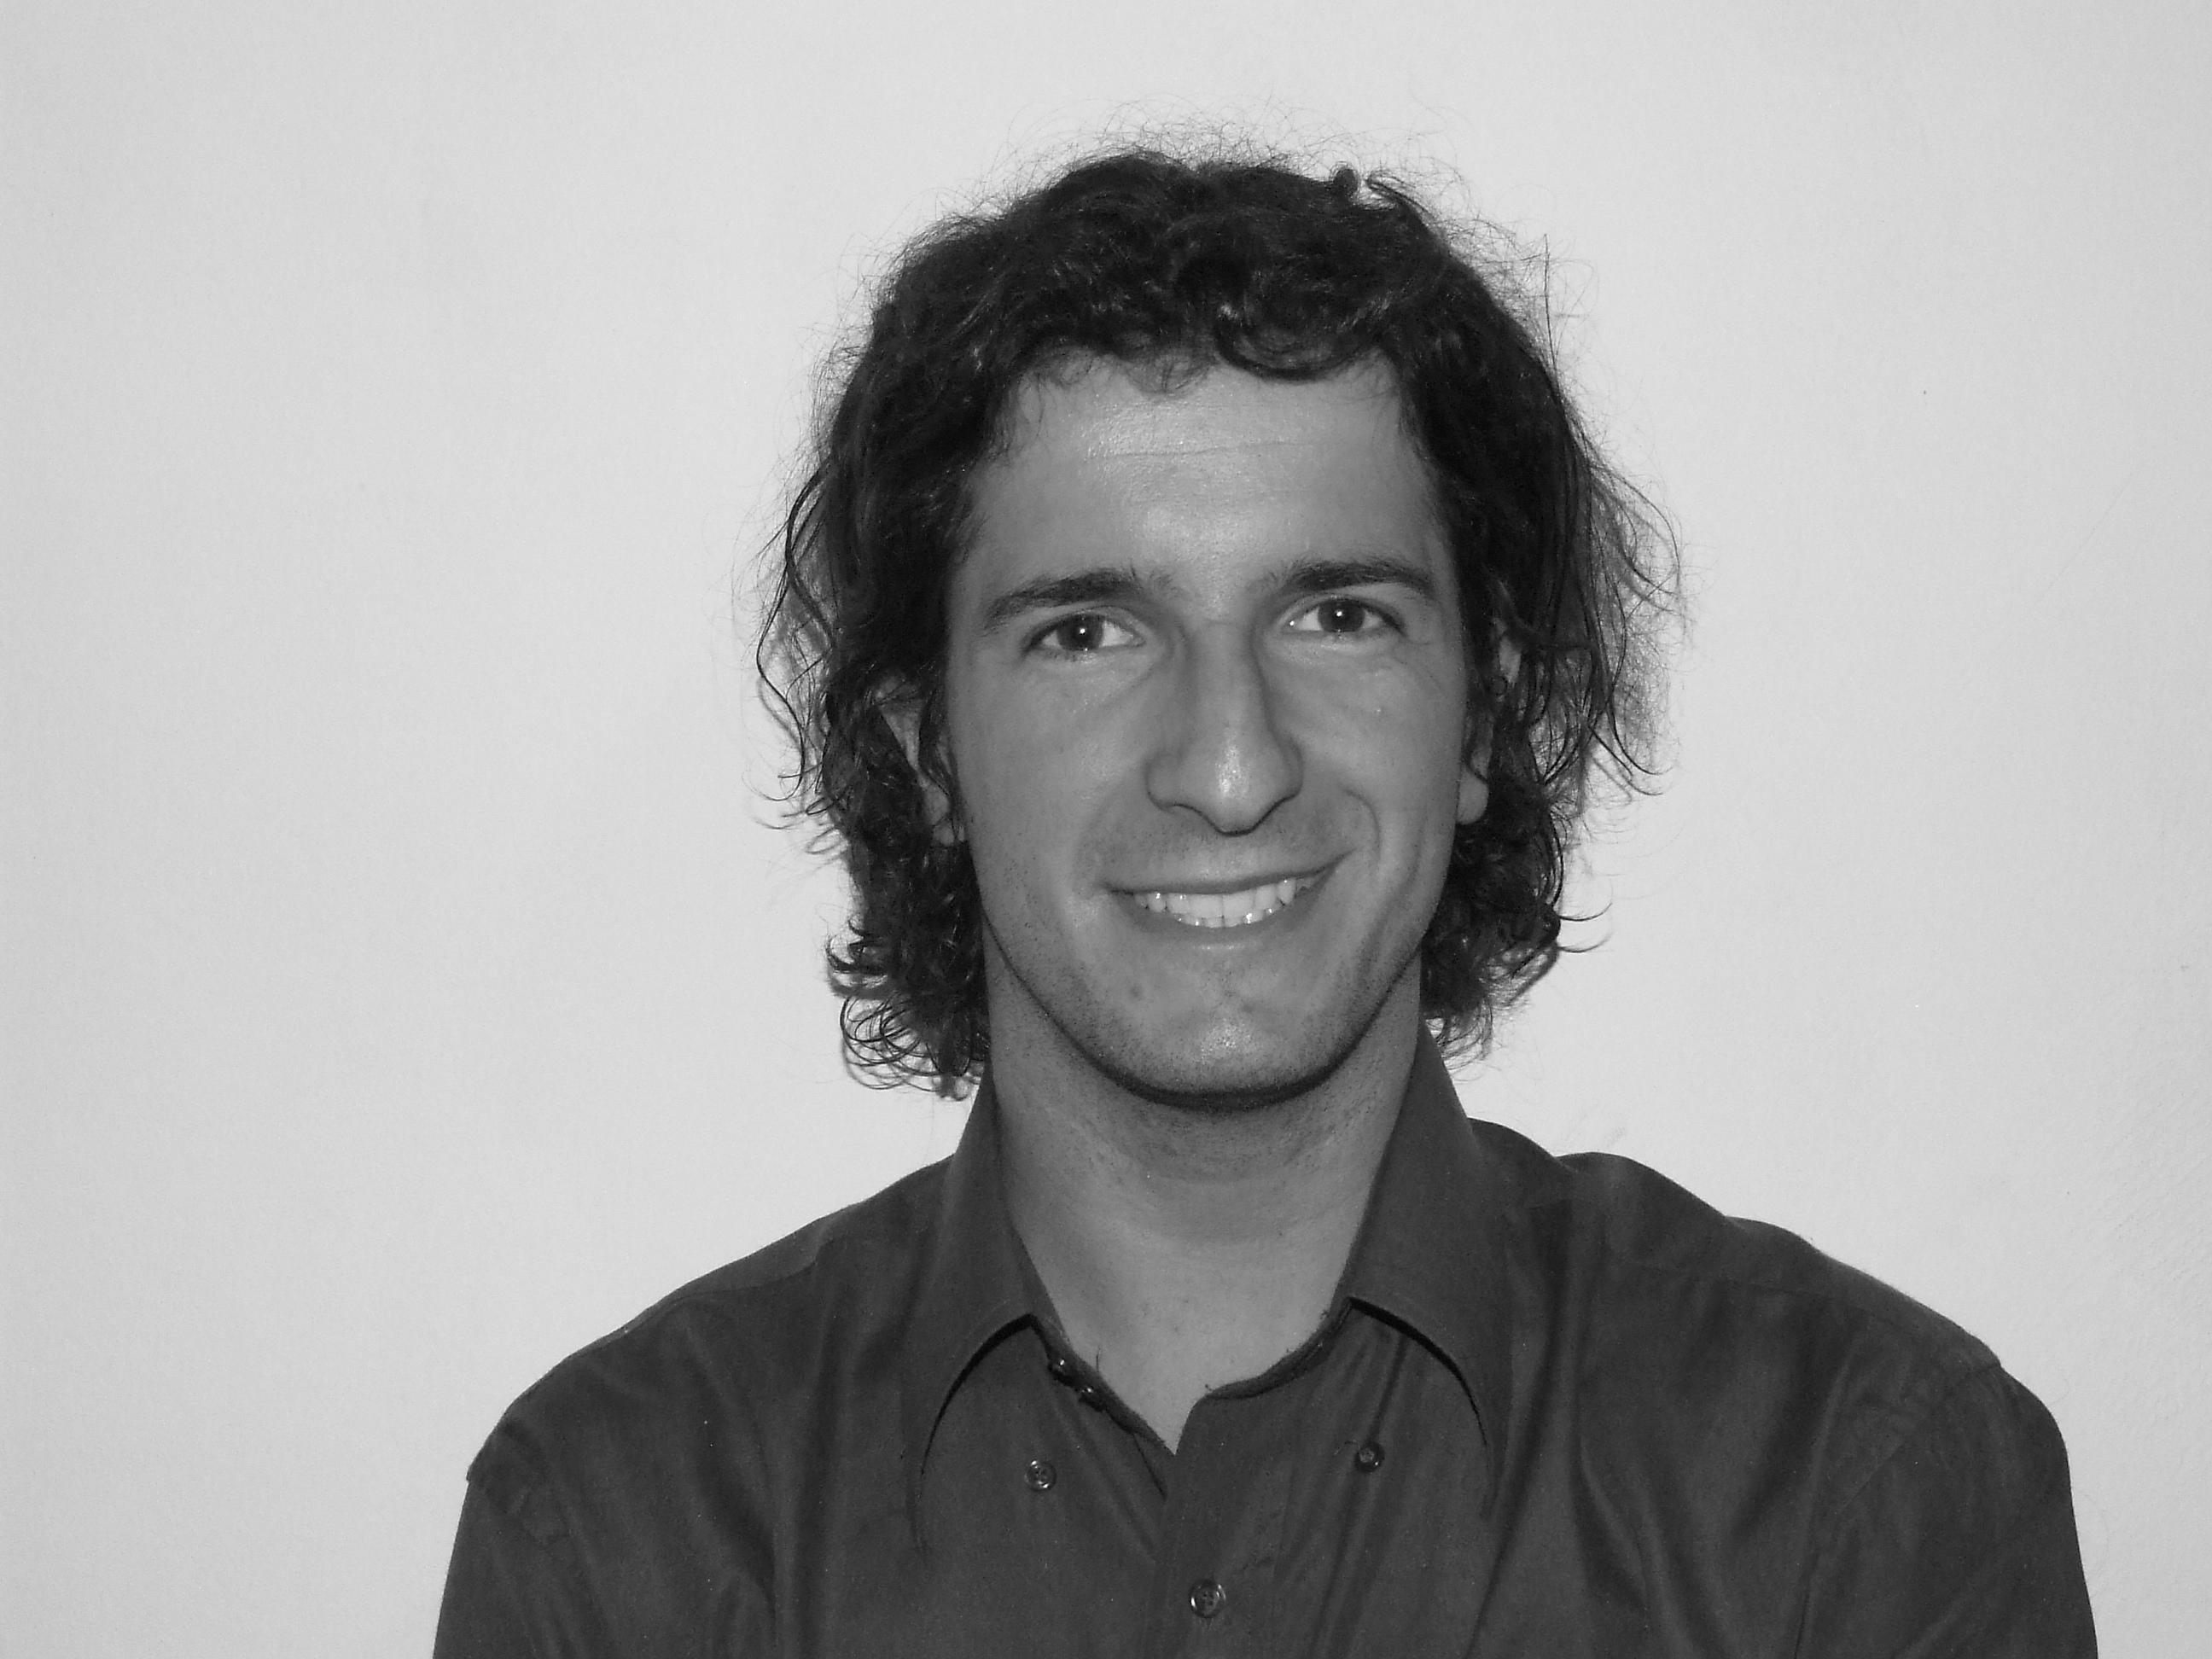 Marco Barzizza - Datasport